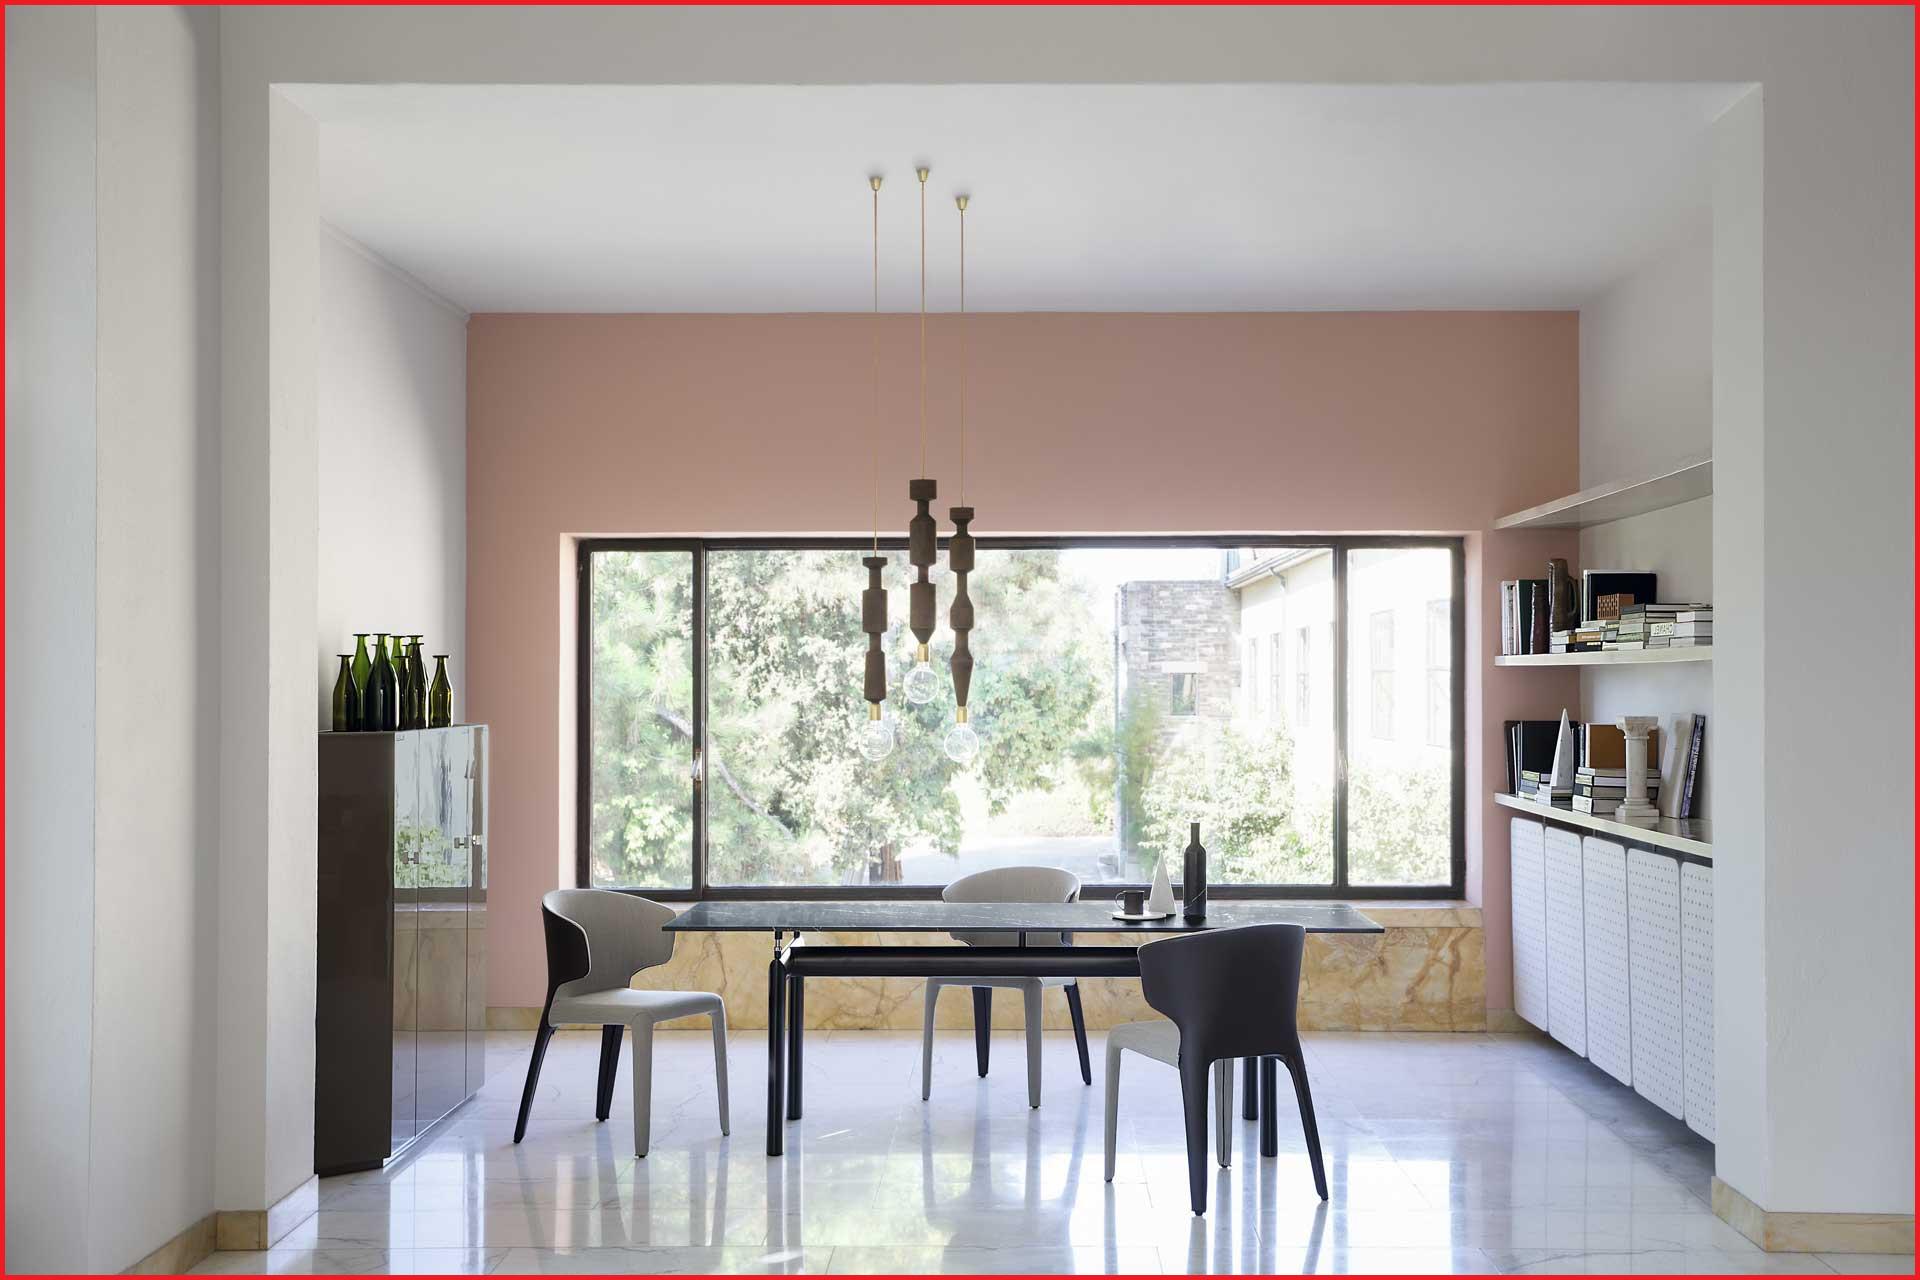 Muebles De Baño Online Outlet 8ydm Arquitectura De Diseà O Para Su Hogar Arsenalsupremo